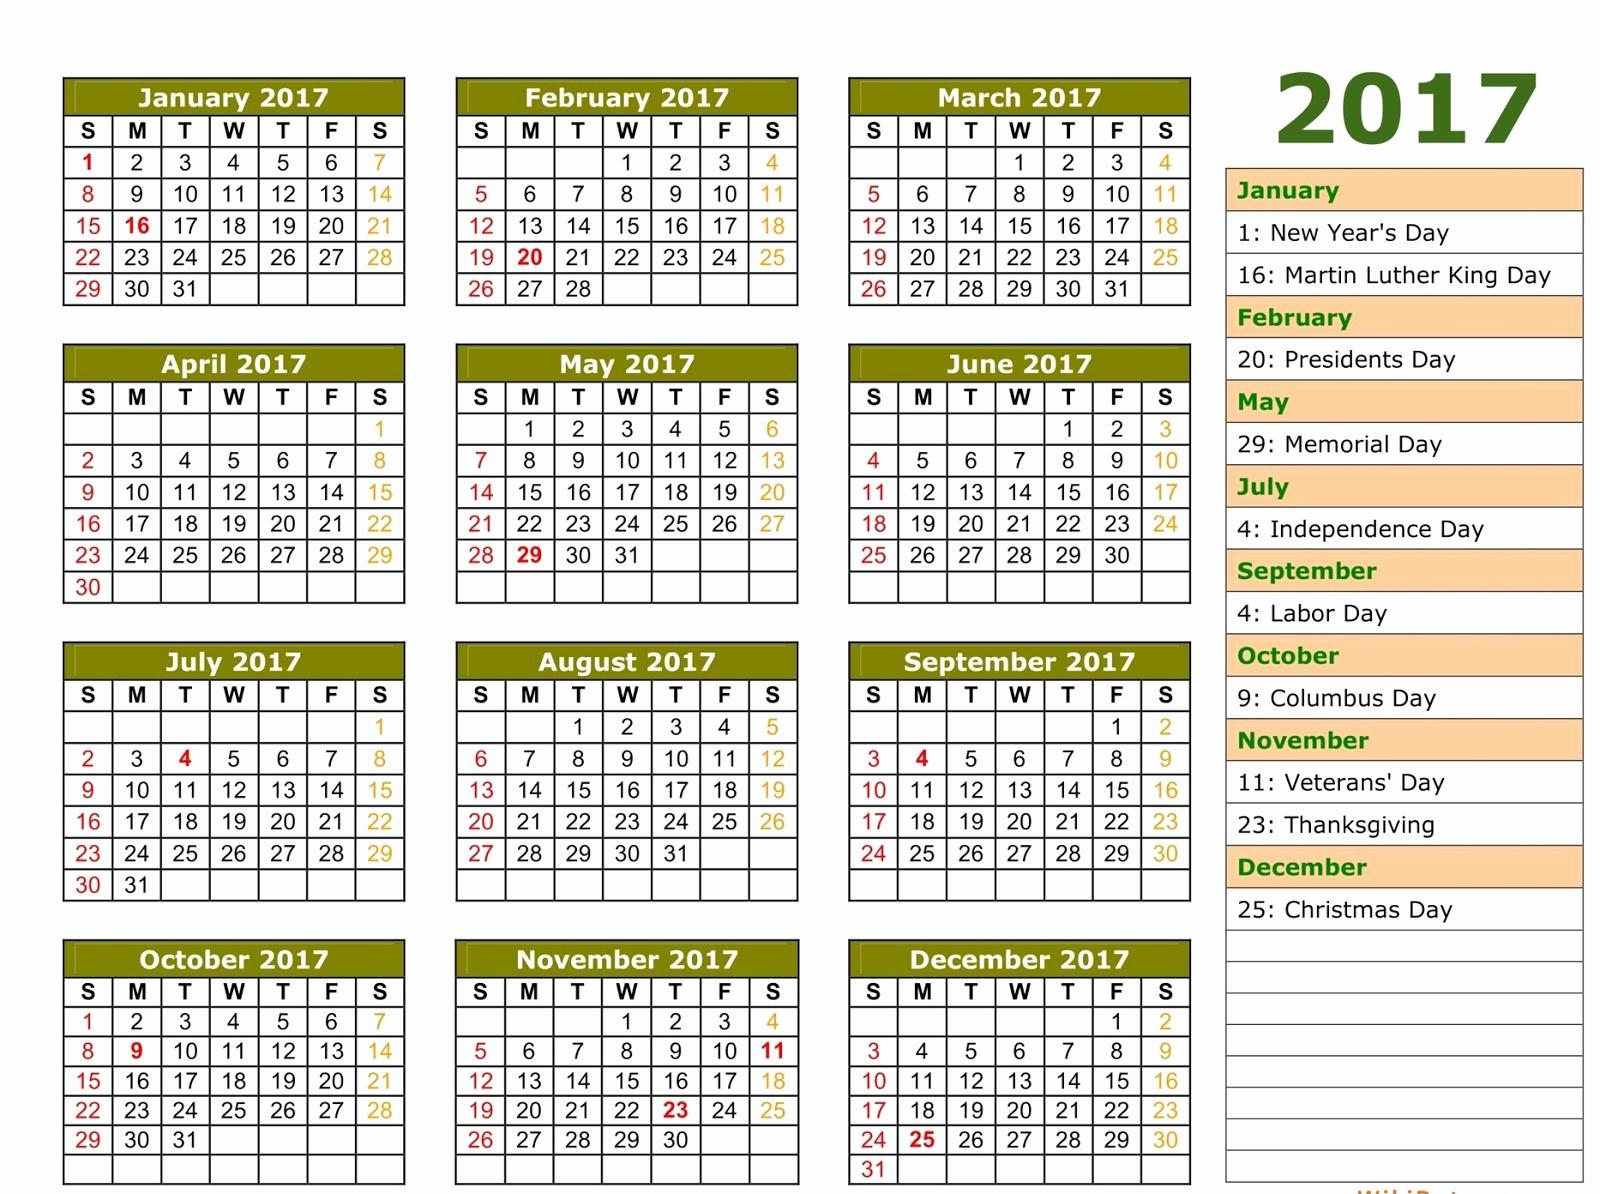 Calendar 2017 Template with Holidays New 2017 Printable Calendar Template Holidays Excel & Word